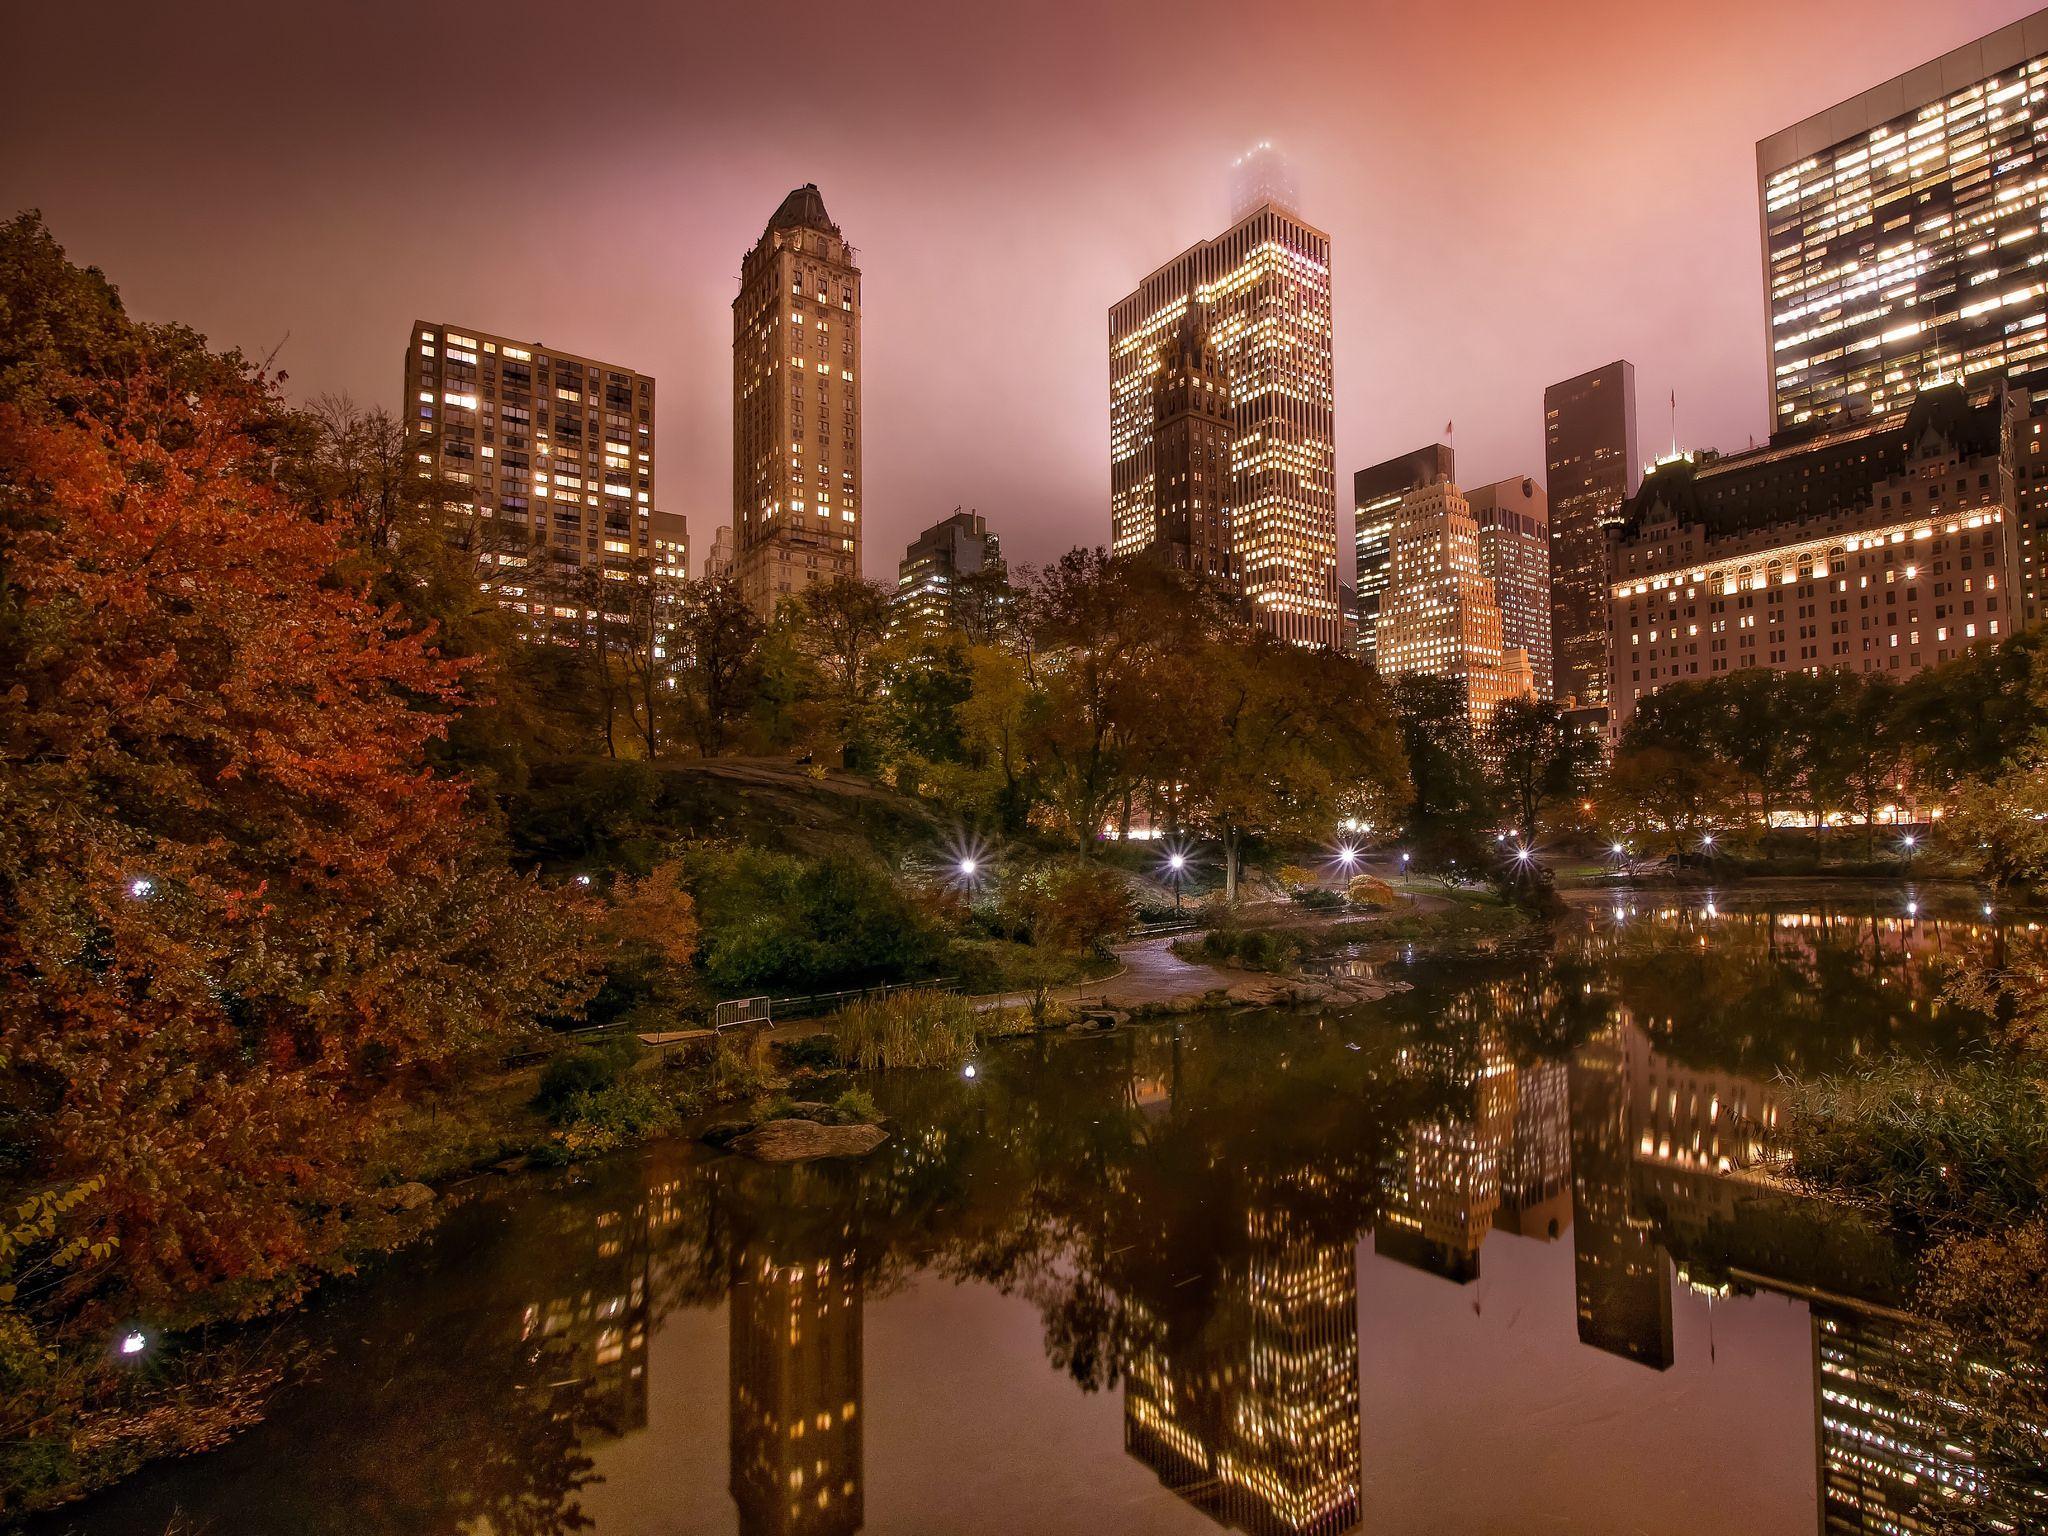 """Central park New York City [2048x1536] Photo by Karin"